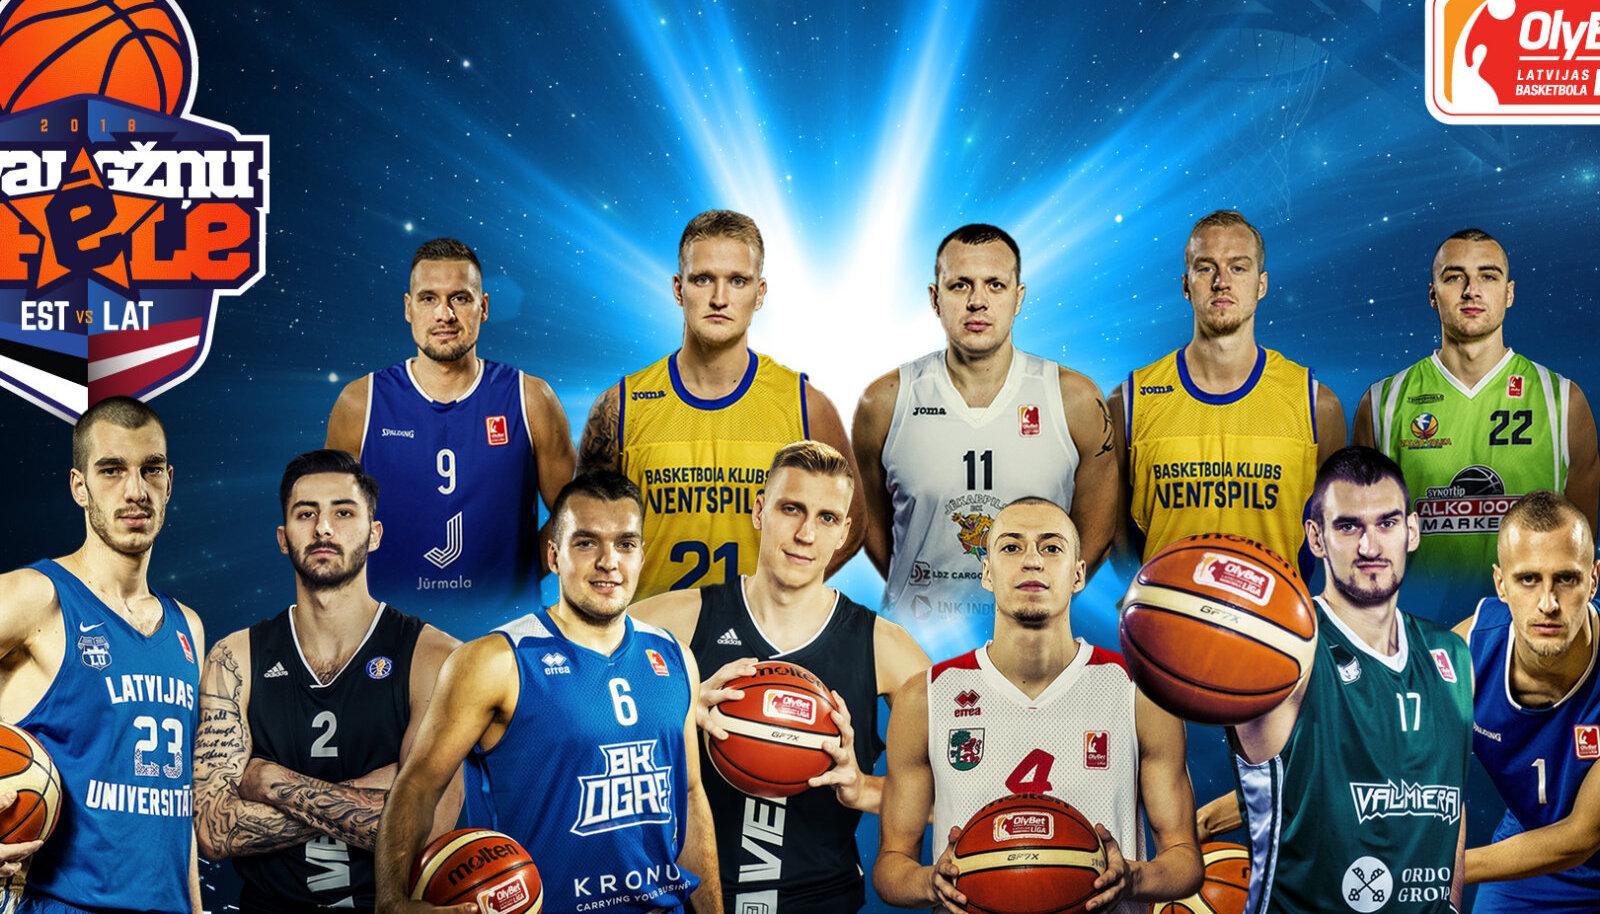 Läti korvpalliliiga Tähtede meeskond